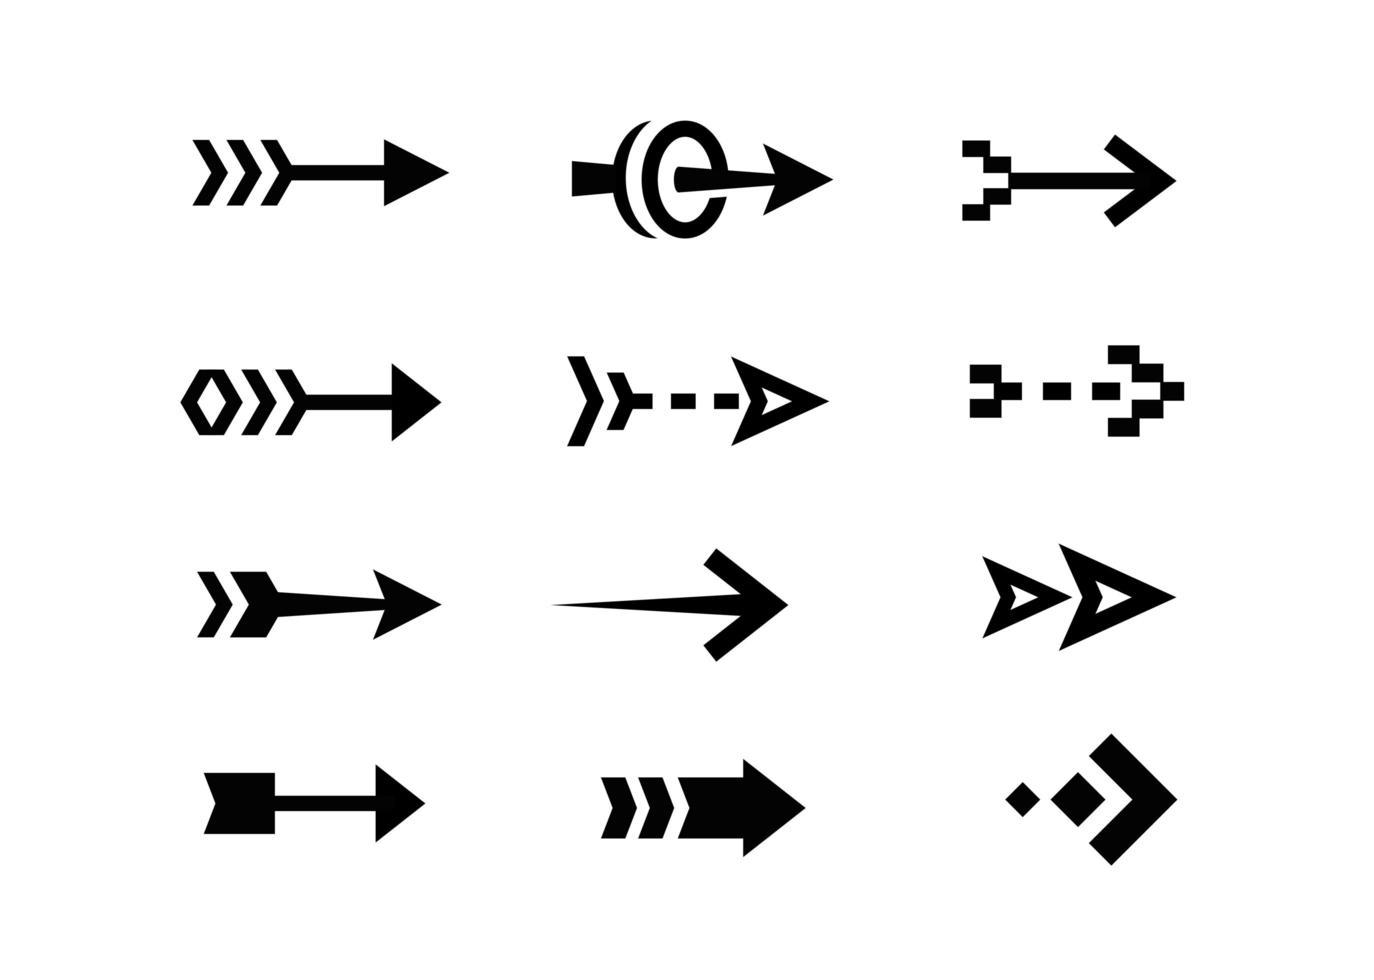 pilikoner platt design samling vektor